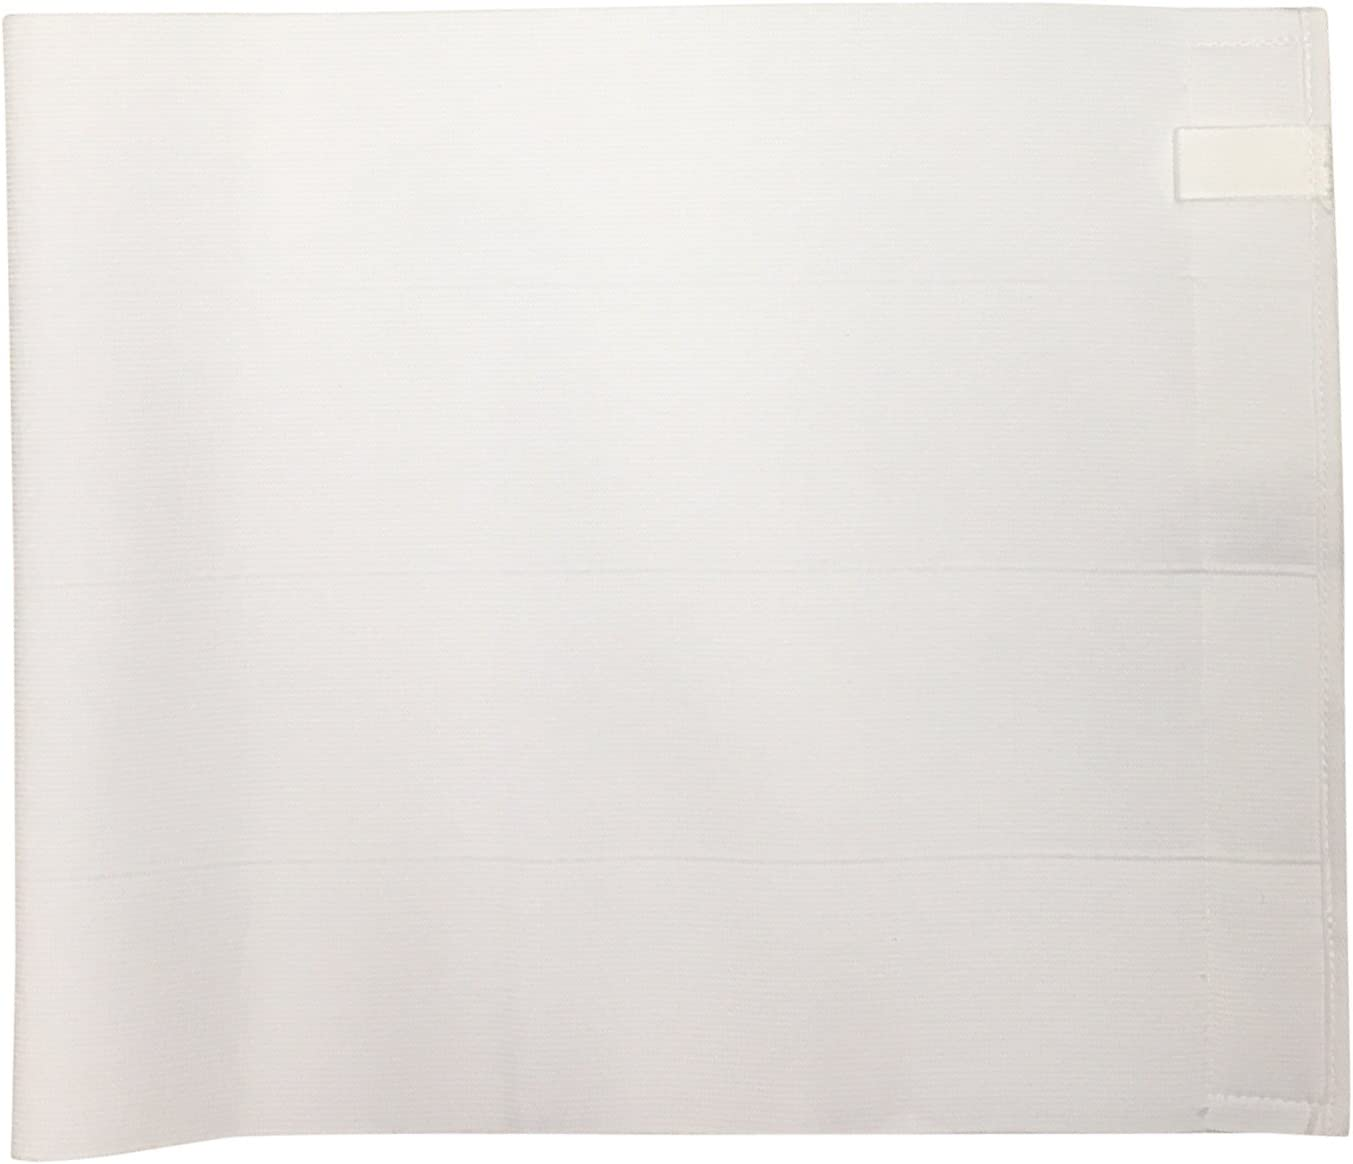 XXX-Large OTC Four-Panel Body Heavy Duty Select Series Abdominal Binder Black